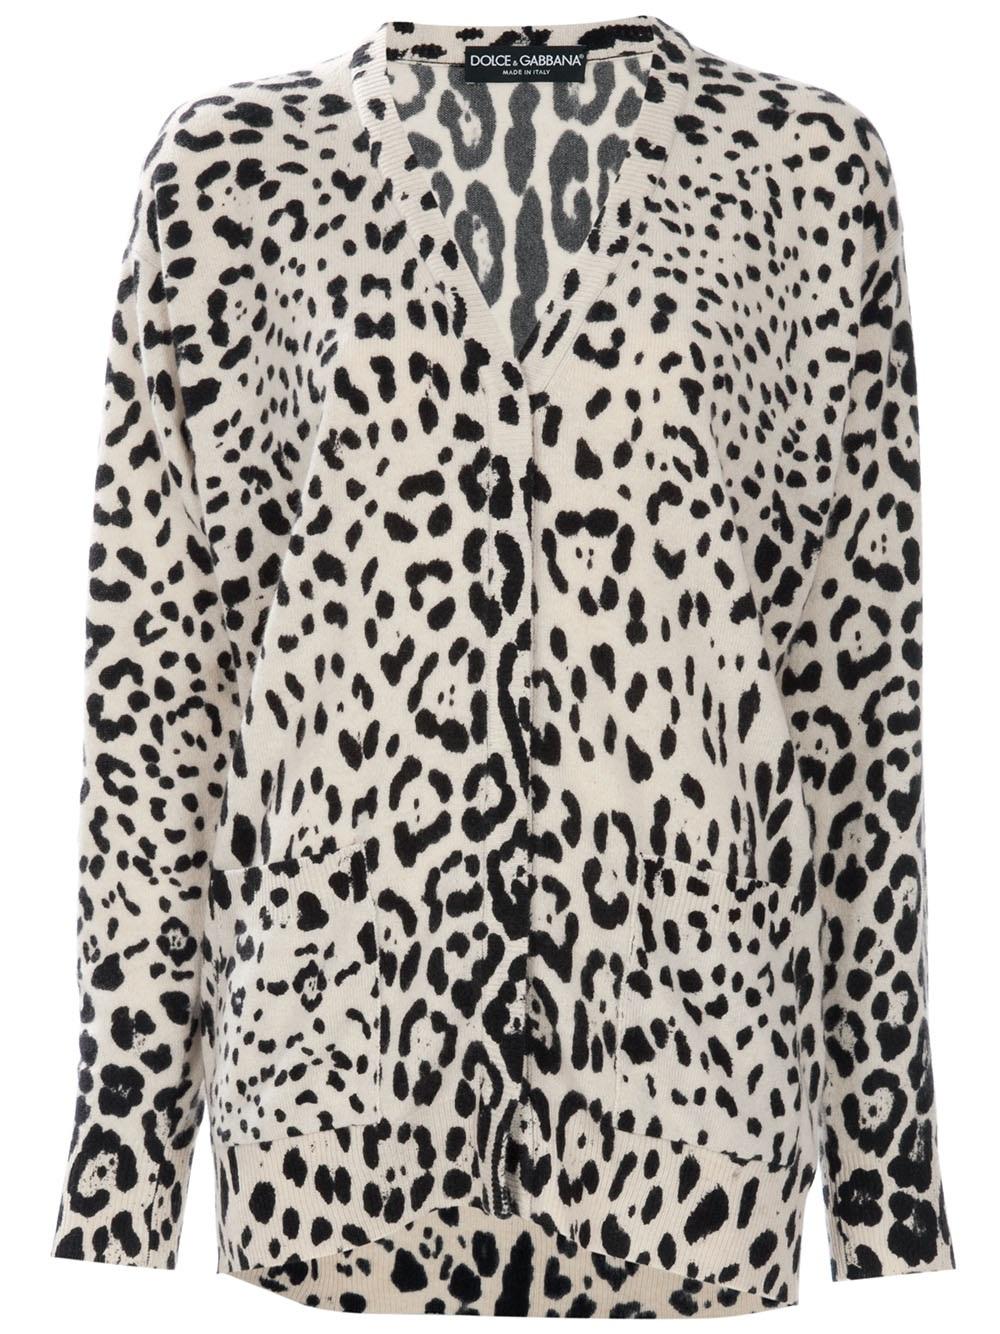 Leopard Print Cardigan Forever 21